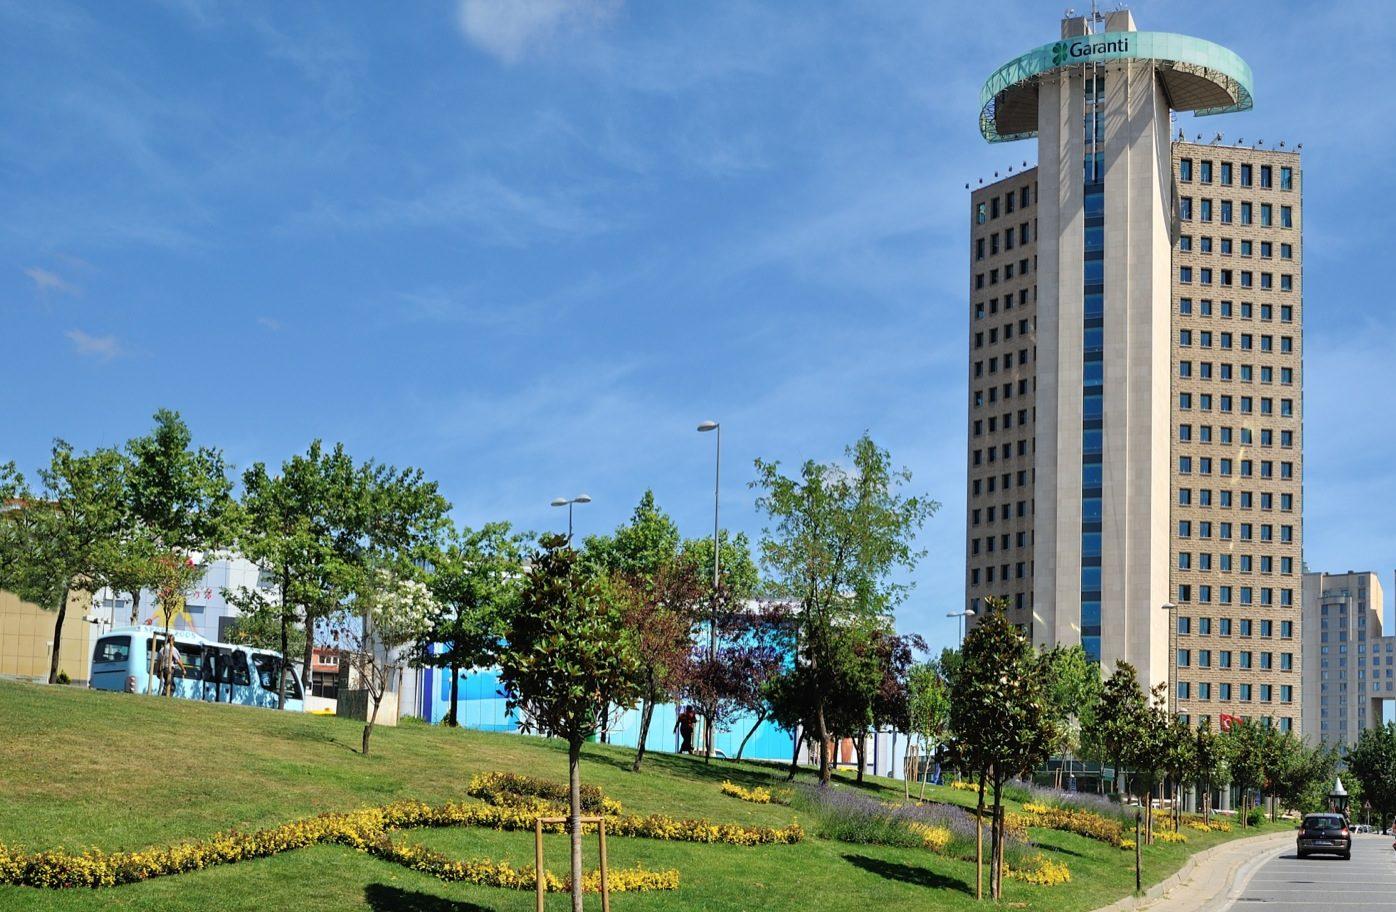 fotografia de garanti torre recurso edificio construccion bbva